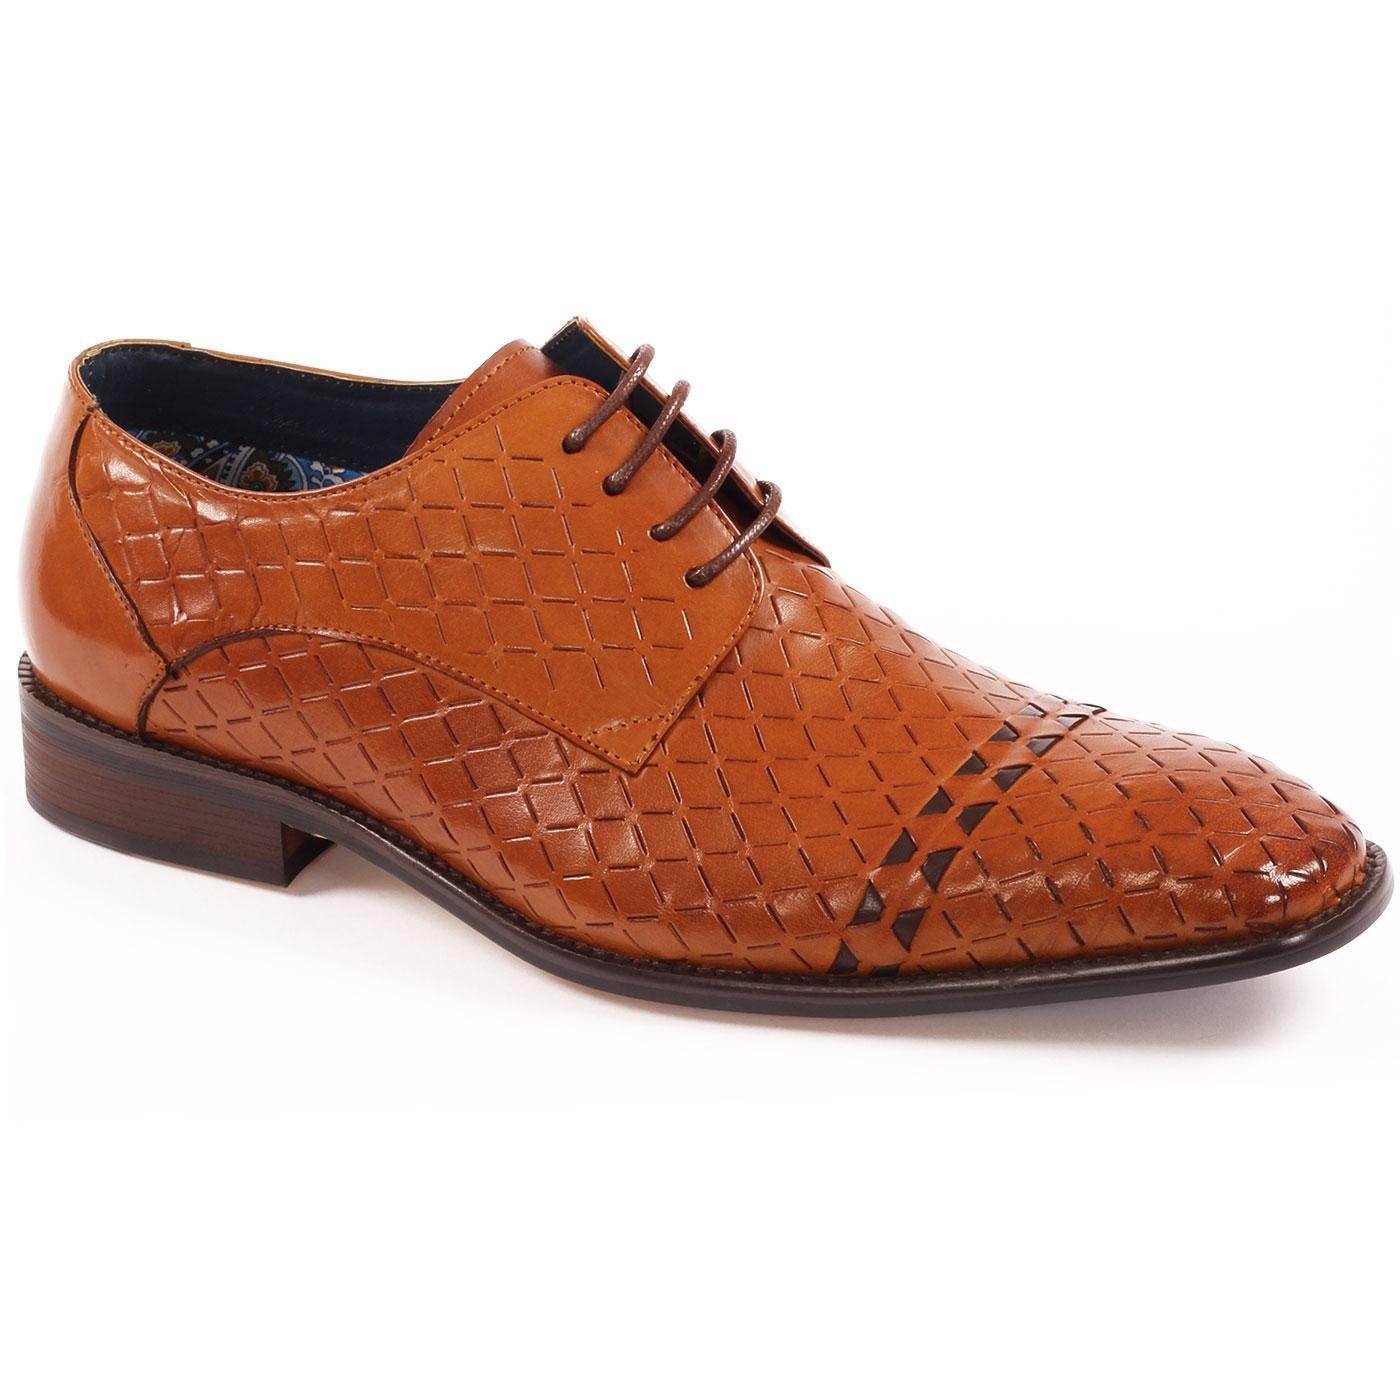 Enoch PAOLO VANDINI Diamond Weave Derby Shoes TAN